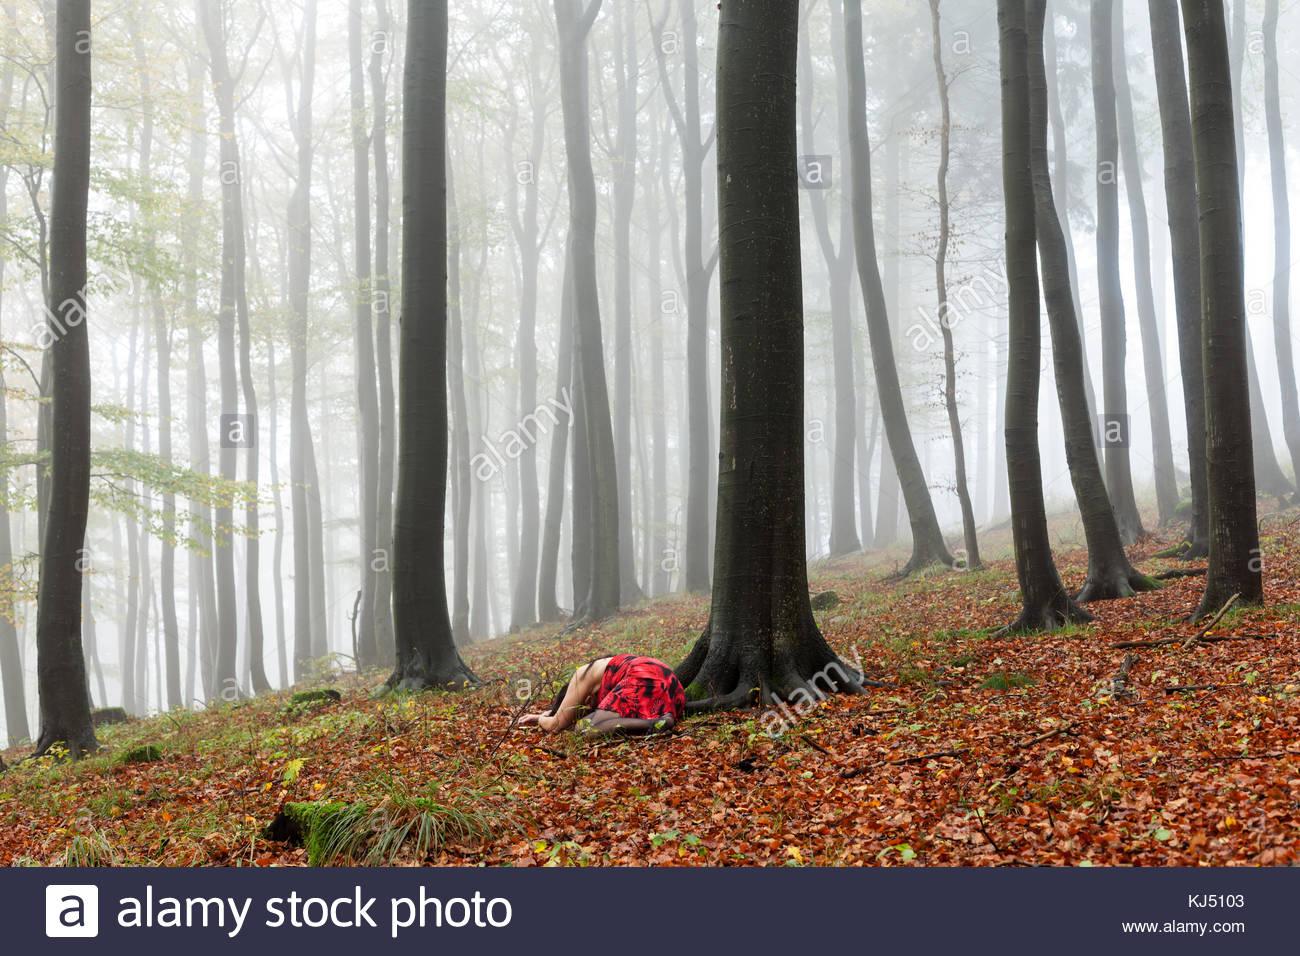 Misty Herbst Wald mit liegende Frau wie tot Stockbild